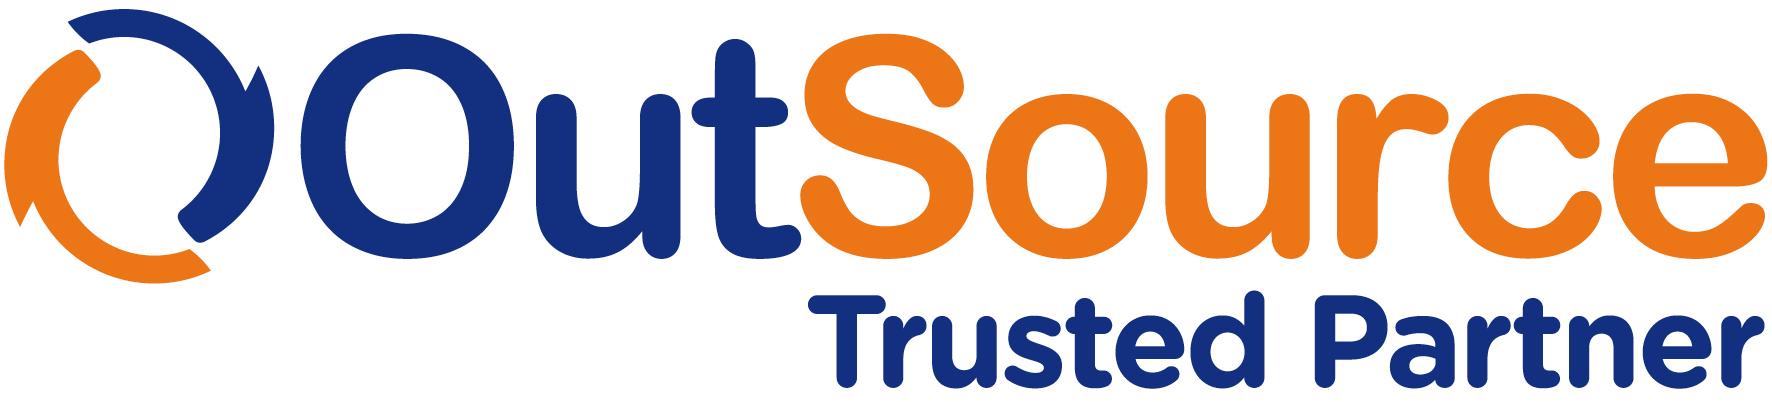 APSCo Outstanding Trusted Partner